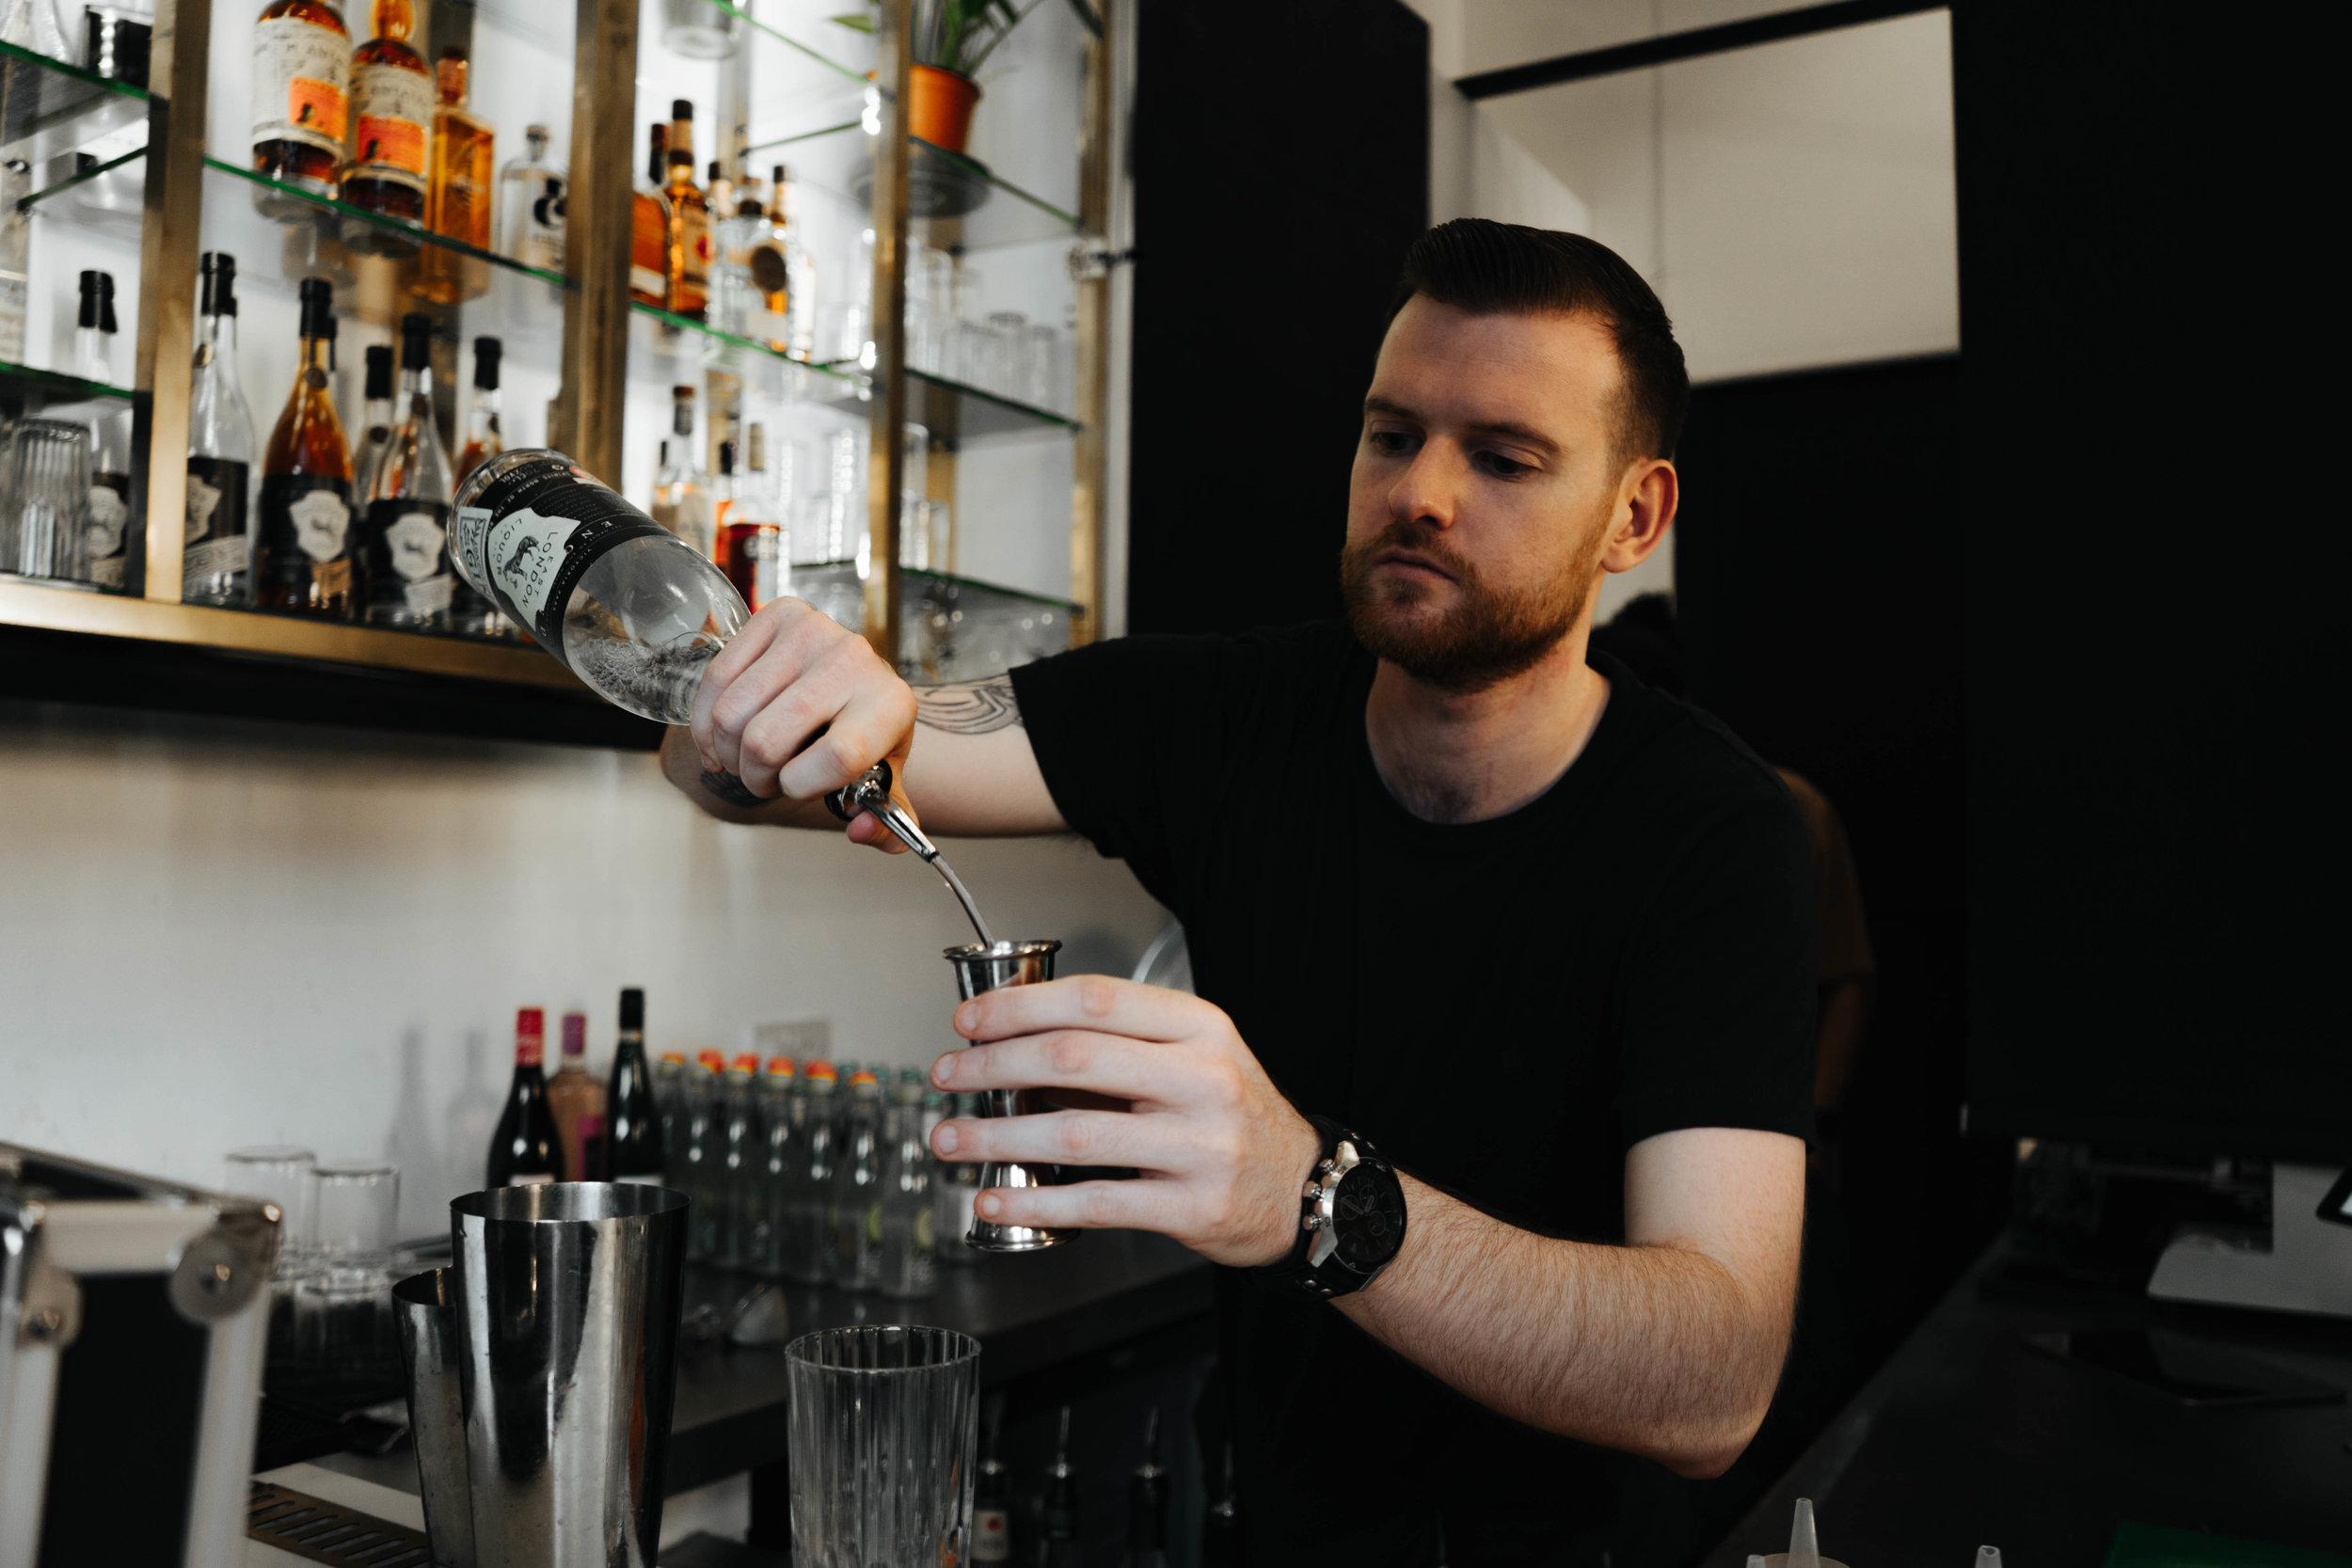 Manchester_Deansgate_Cocktails